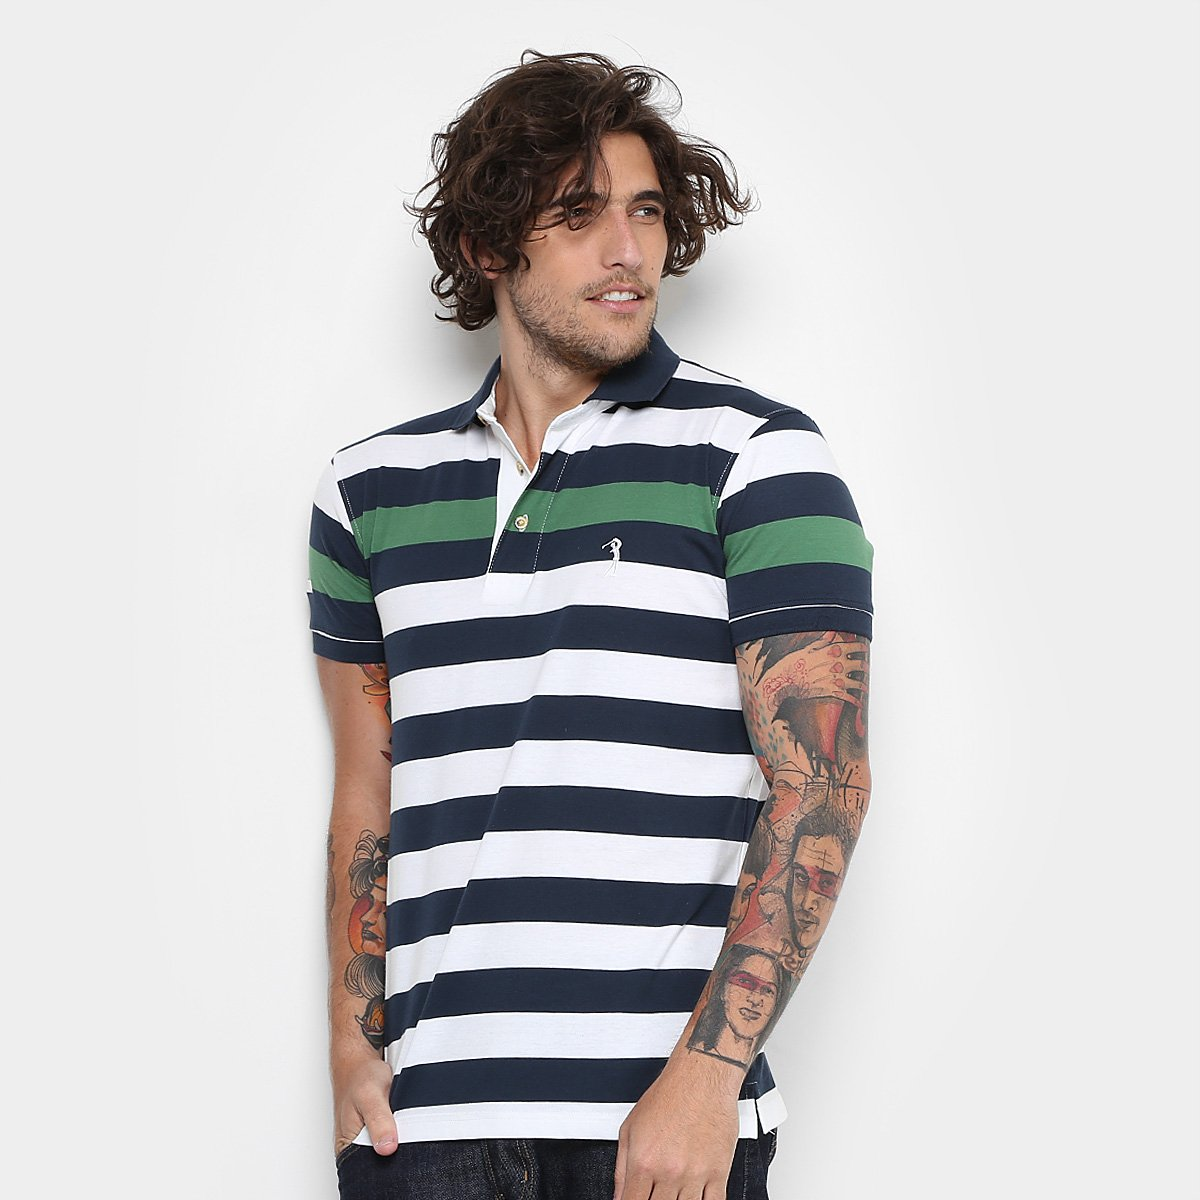 Camisa Polo Aleatory Listrada Fio Tinto Masculina - Compre Agora ... 7ece416e535b6